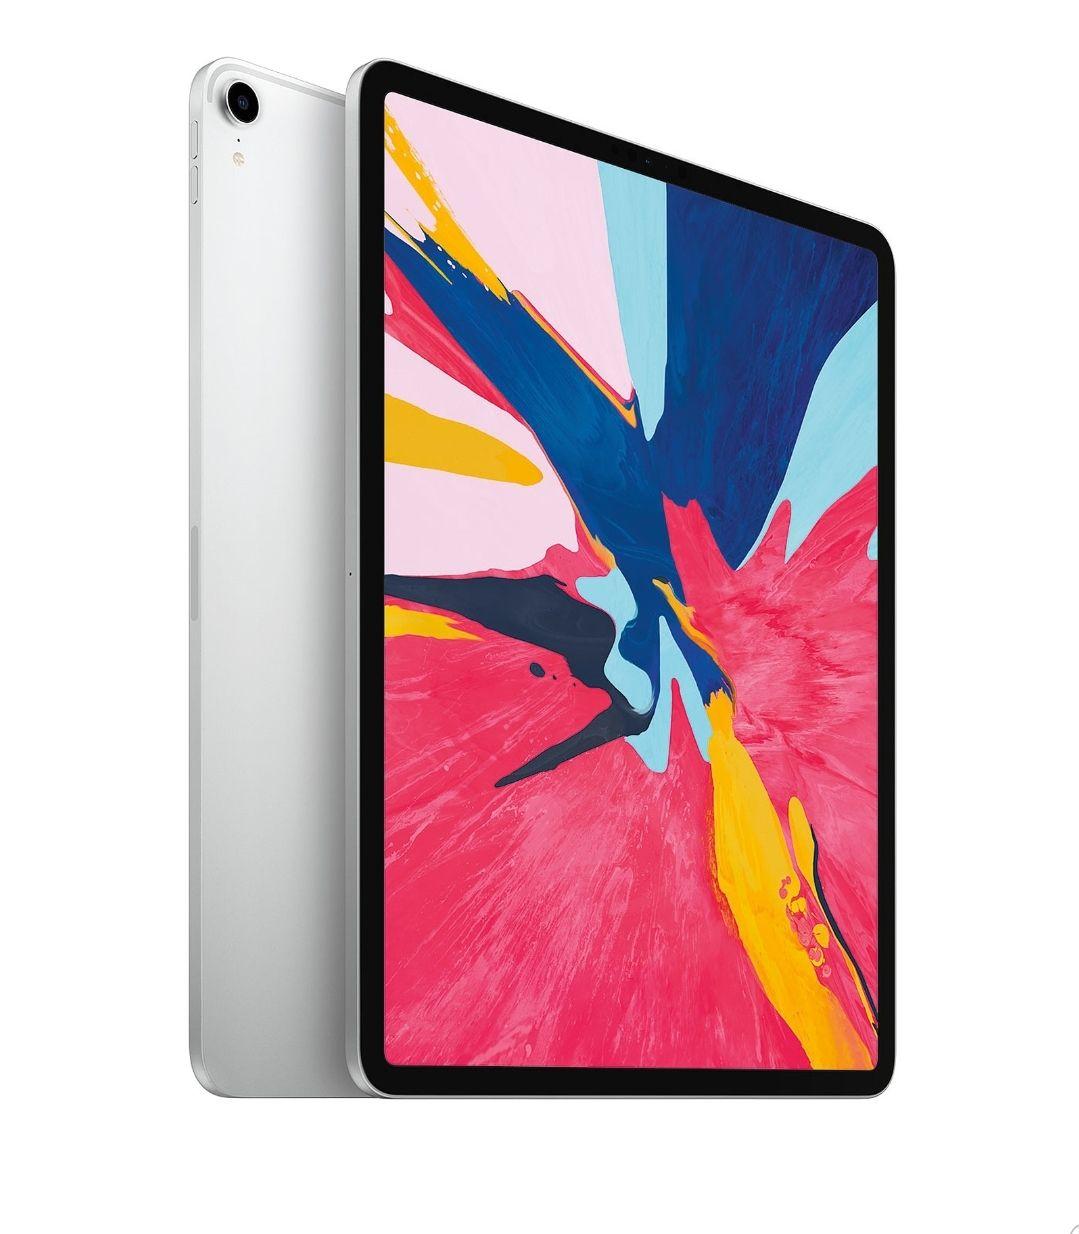 "Tablette 12,9"" Apple iPad Pro (2018) - WiFi, 64 Go, Argent"